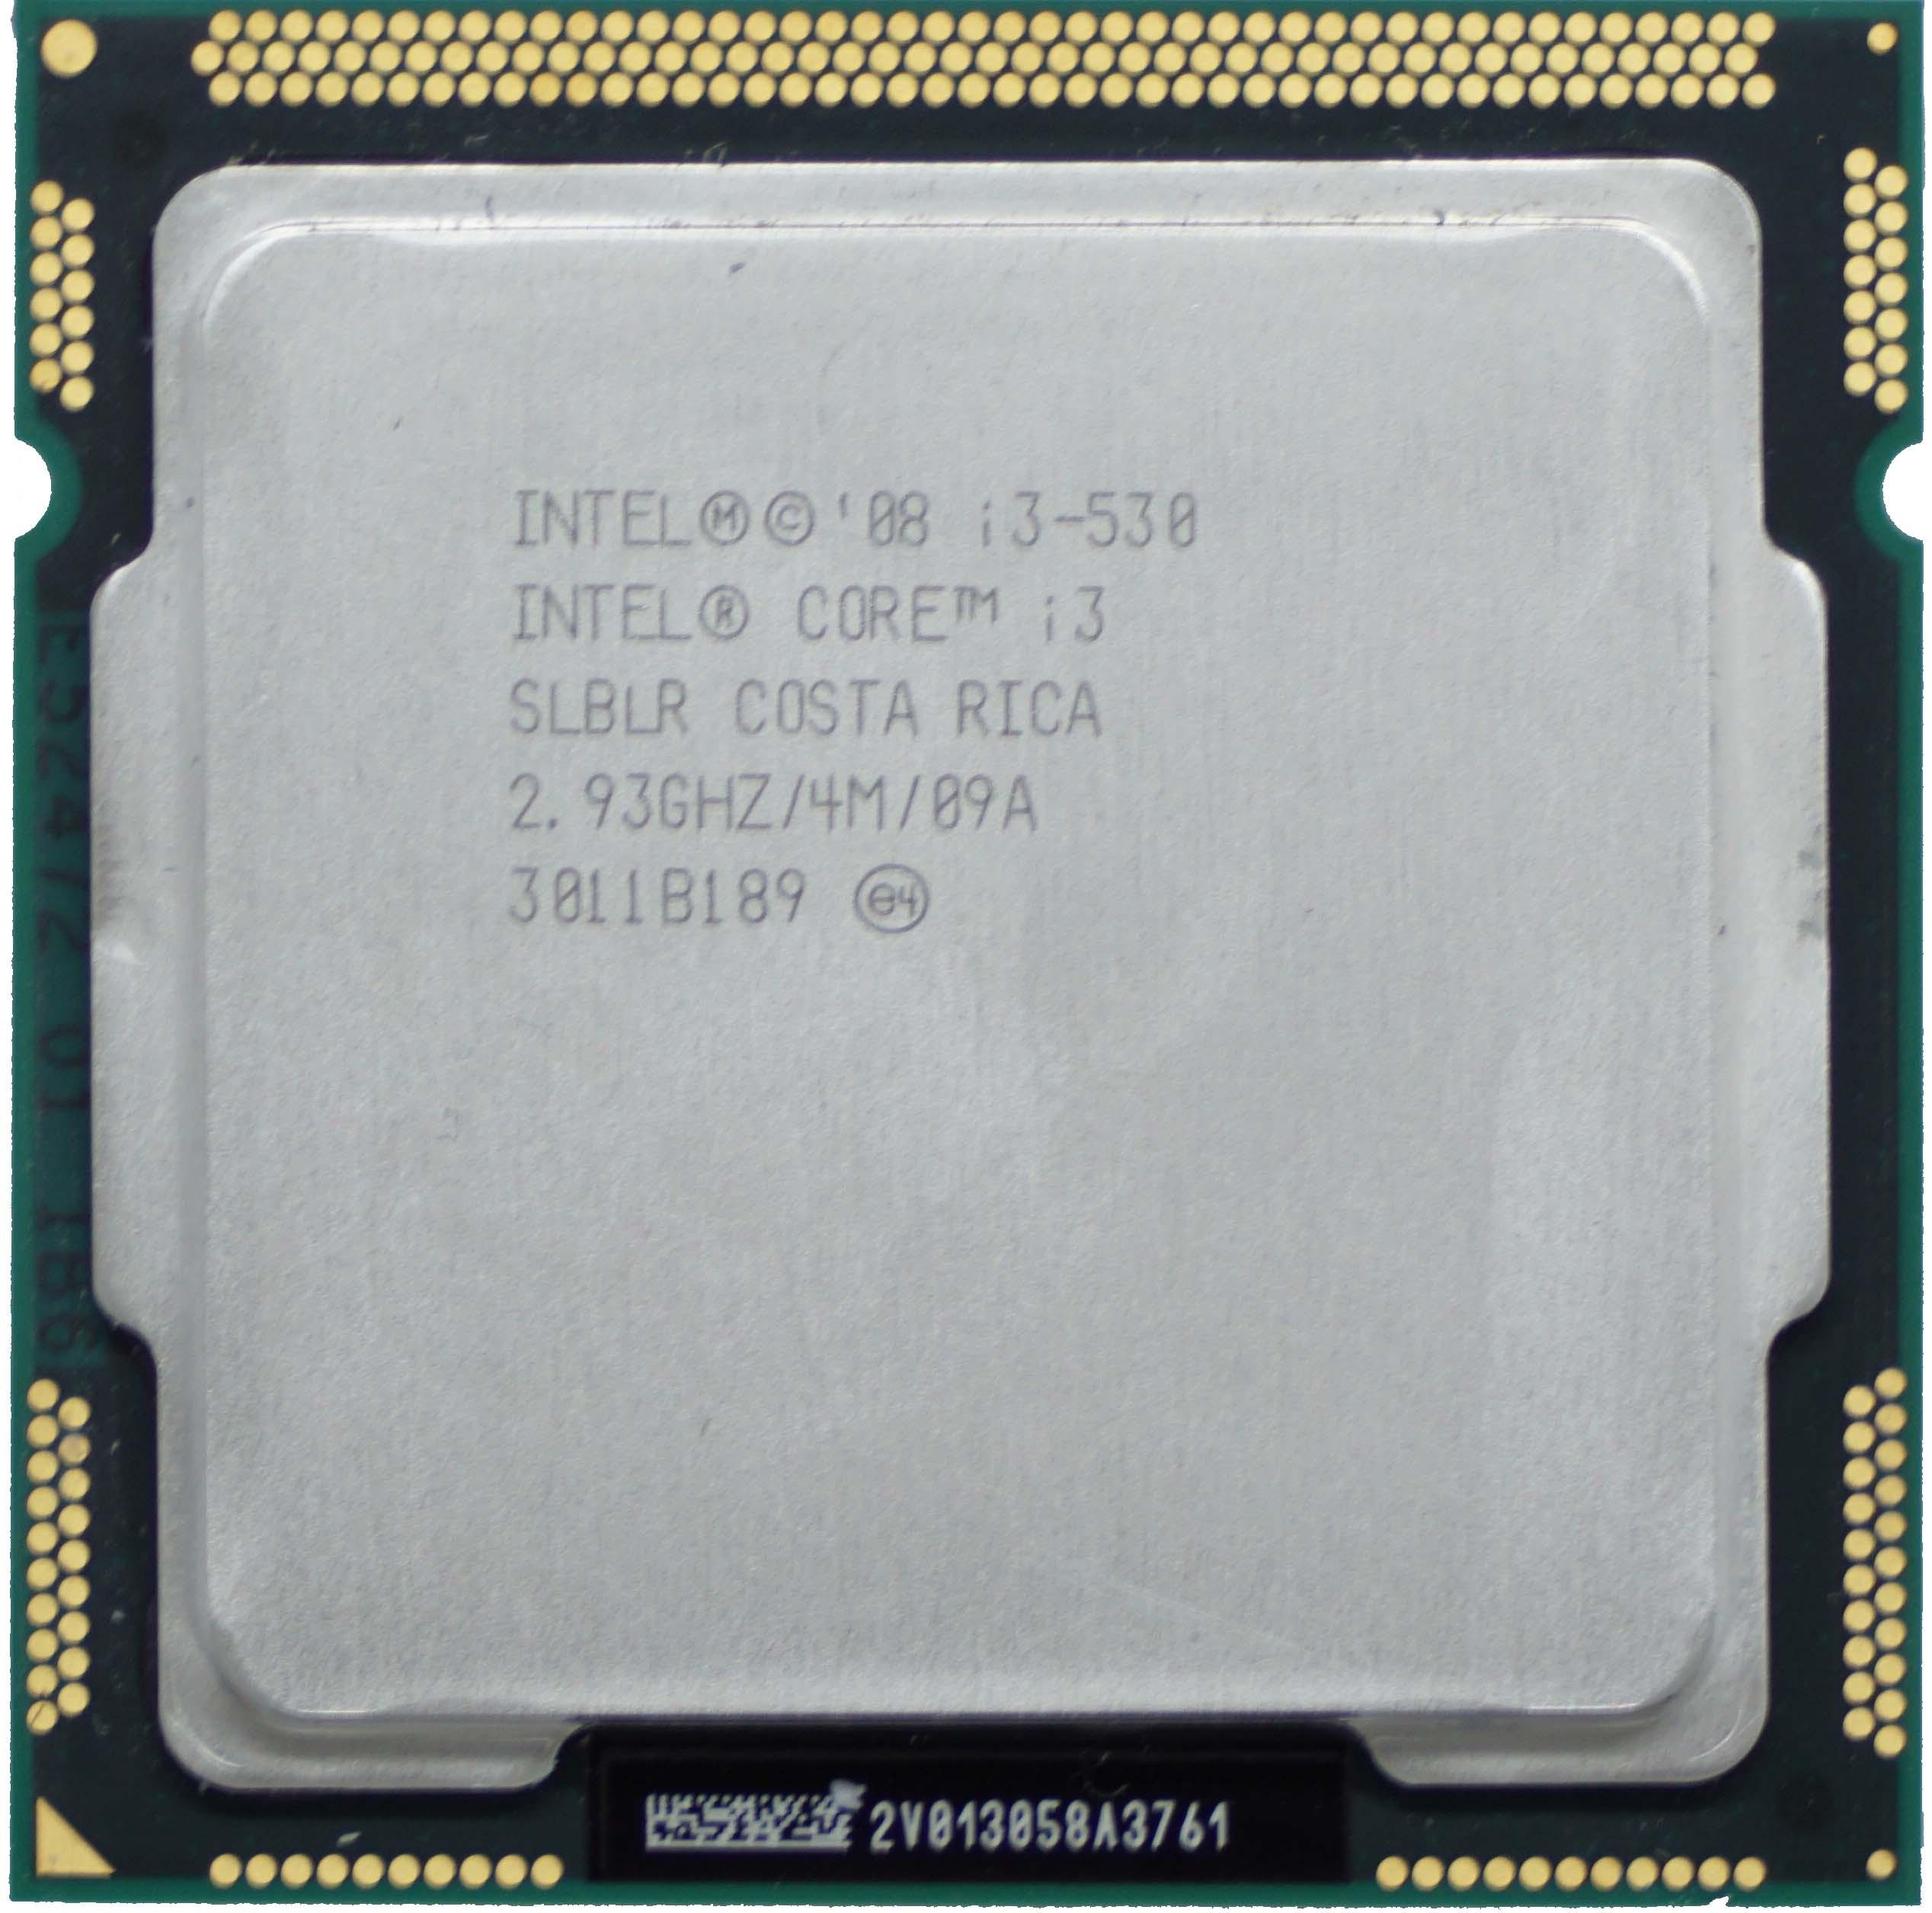 Intel Core i3-530 (SLBLR) 2 93Ghz Dual (2) Core LGA1156 73W CPU